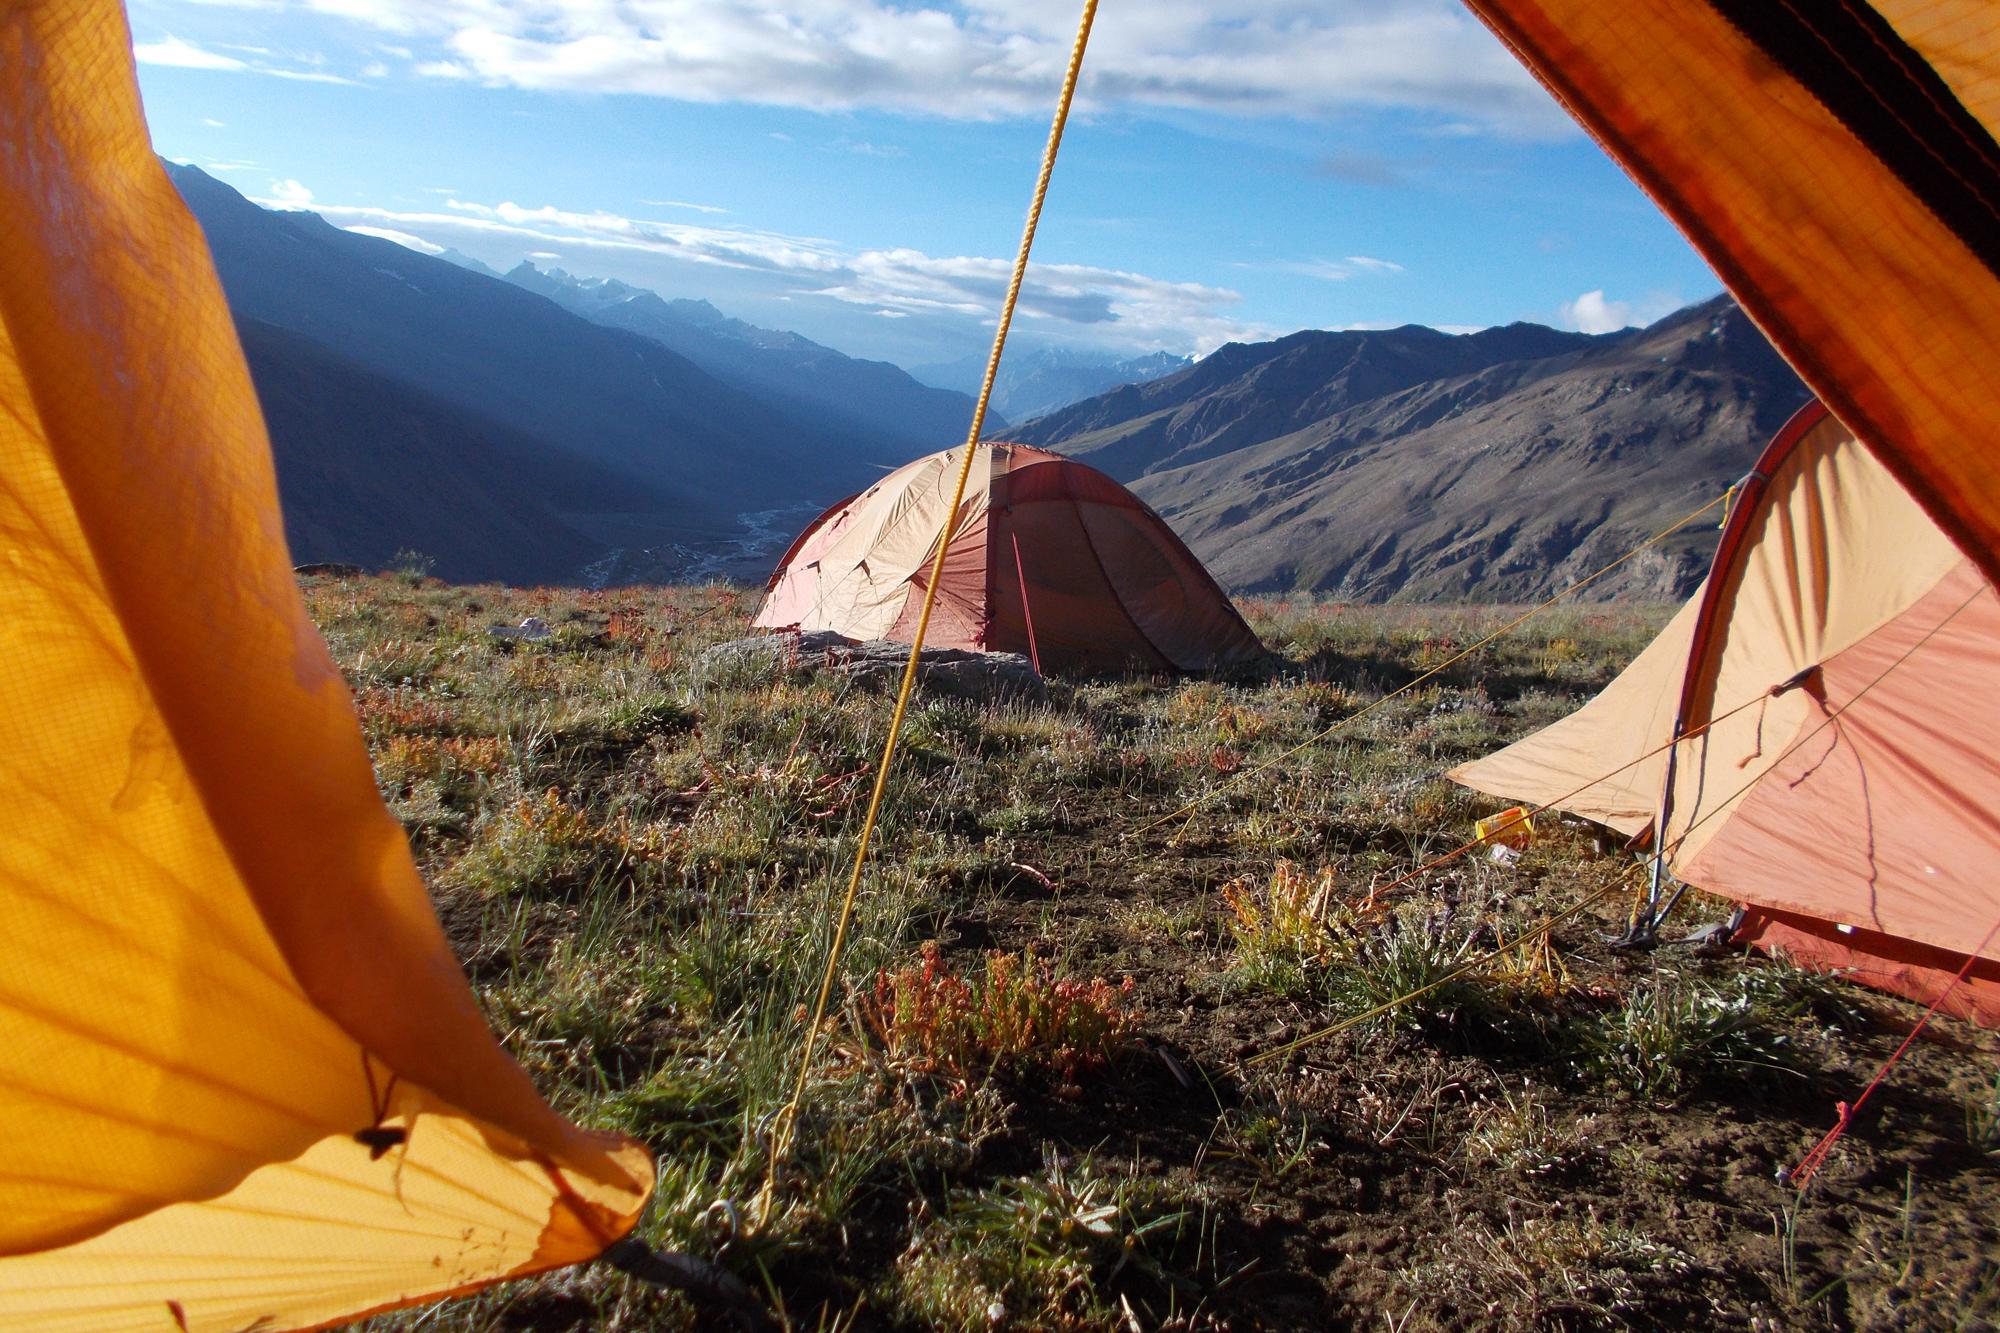 Himalaya 2016, by Chief Scientist Naomi Holmes.